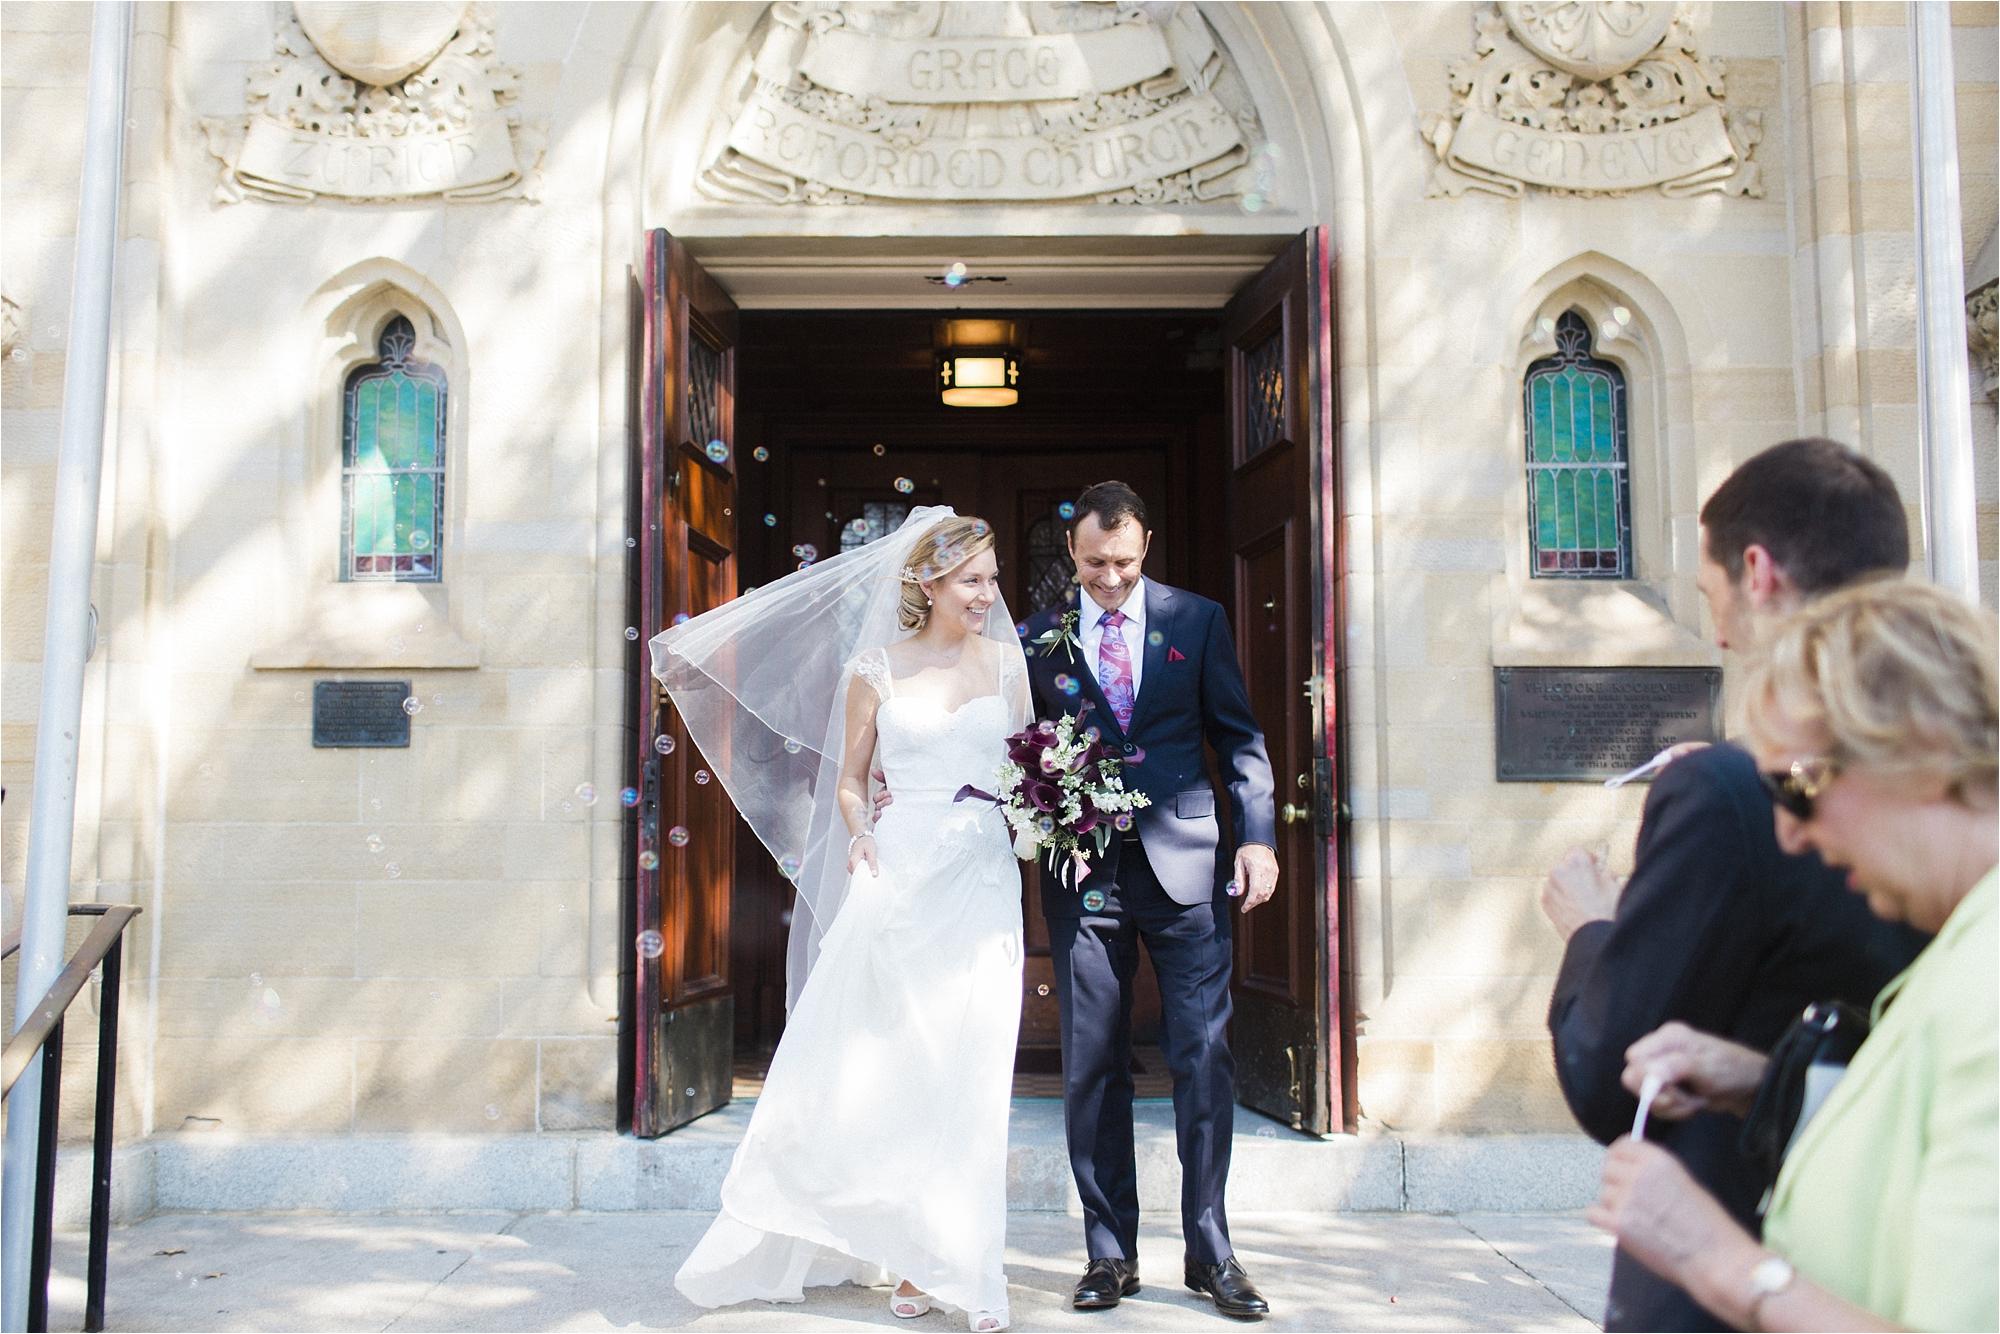 stephanie-yonce-photography-elegant-private-club-washington-dc-wedding-photos_0018.jpg